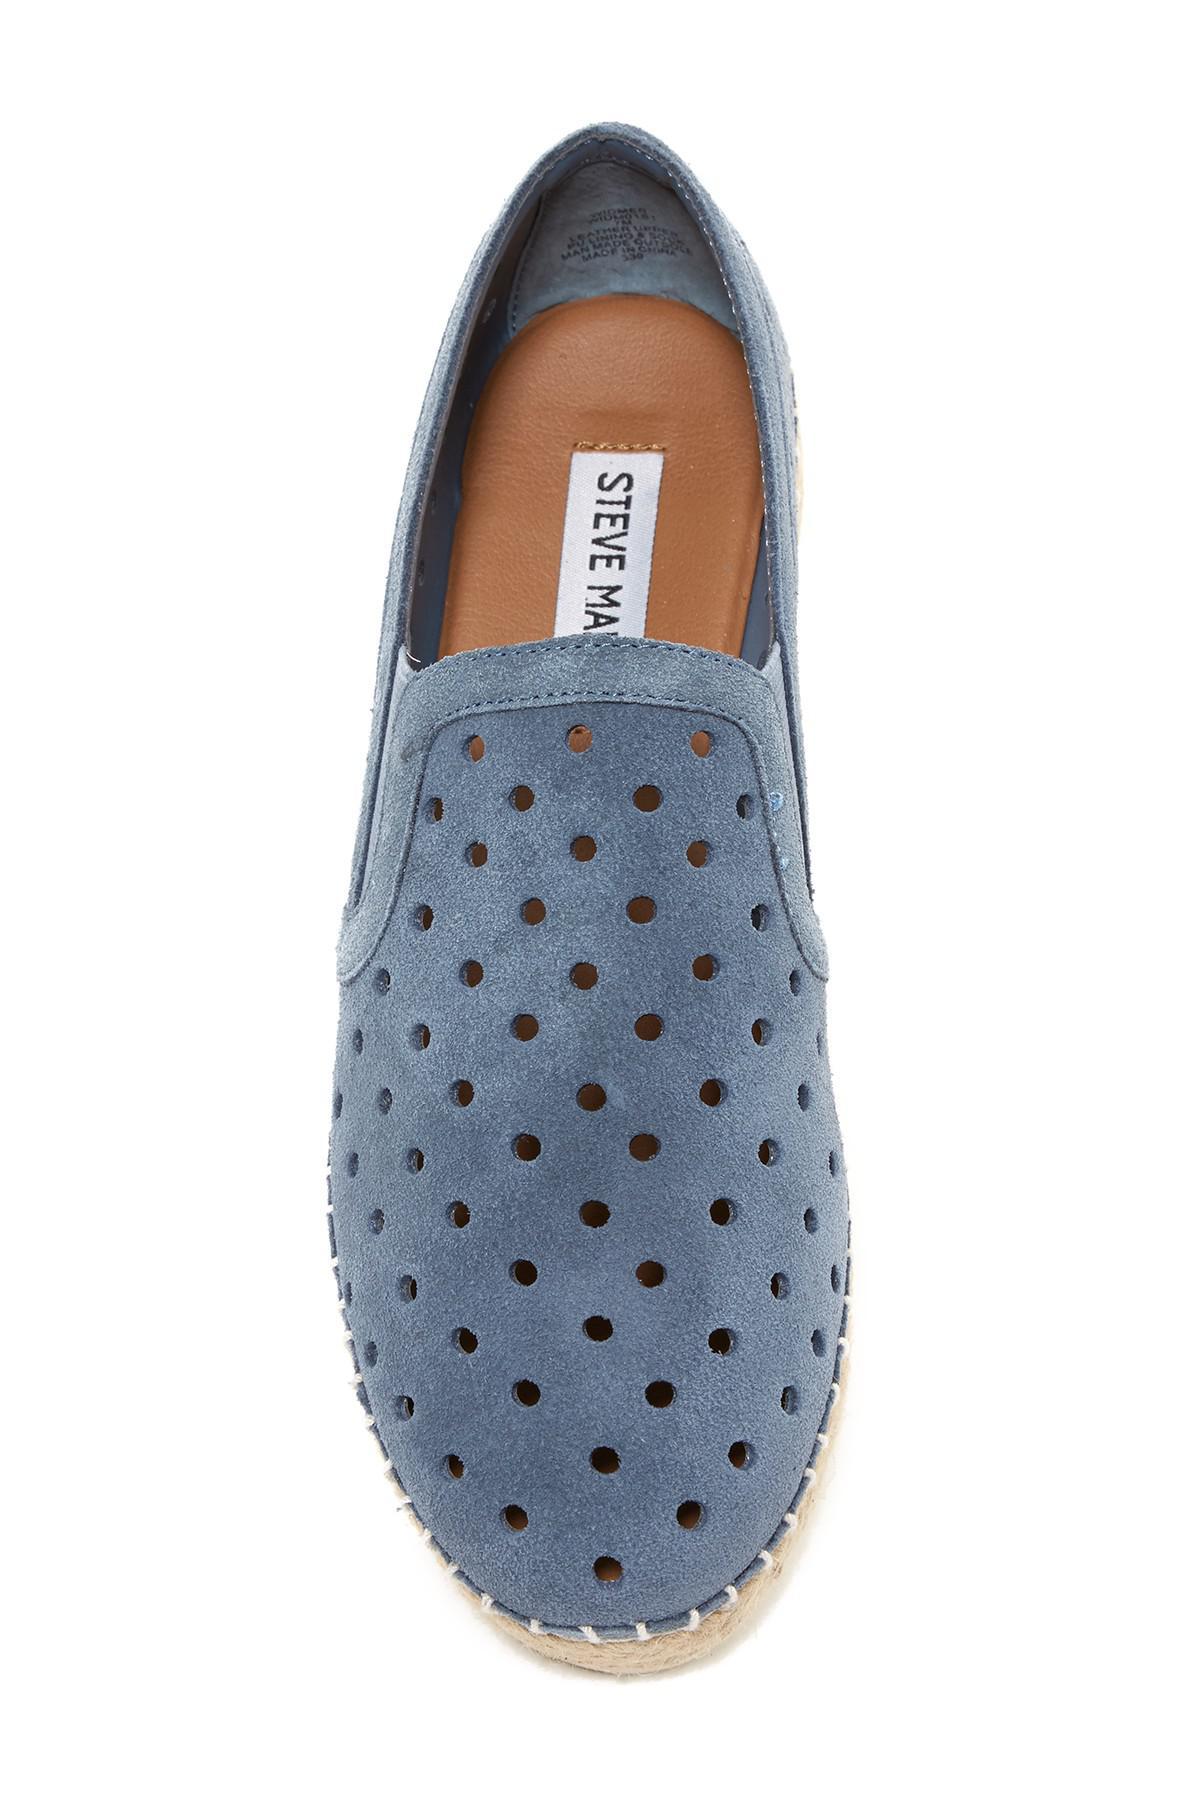 2f3381b0ba3 Steve Madden Blue Widmer Suede Espadrille Sneaker